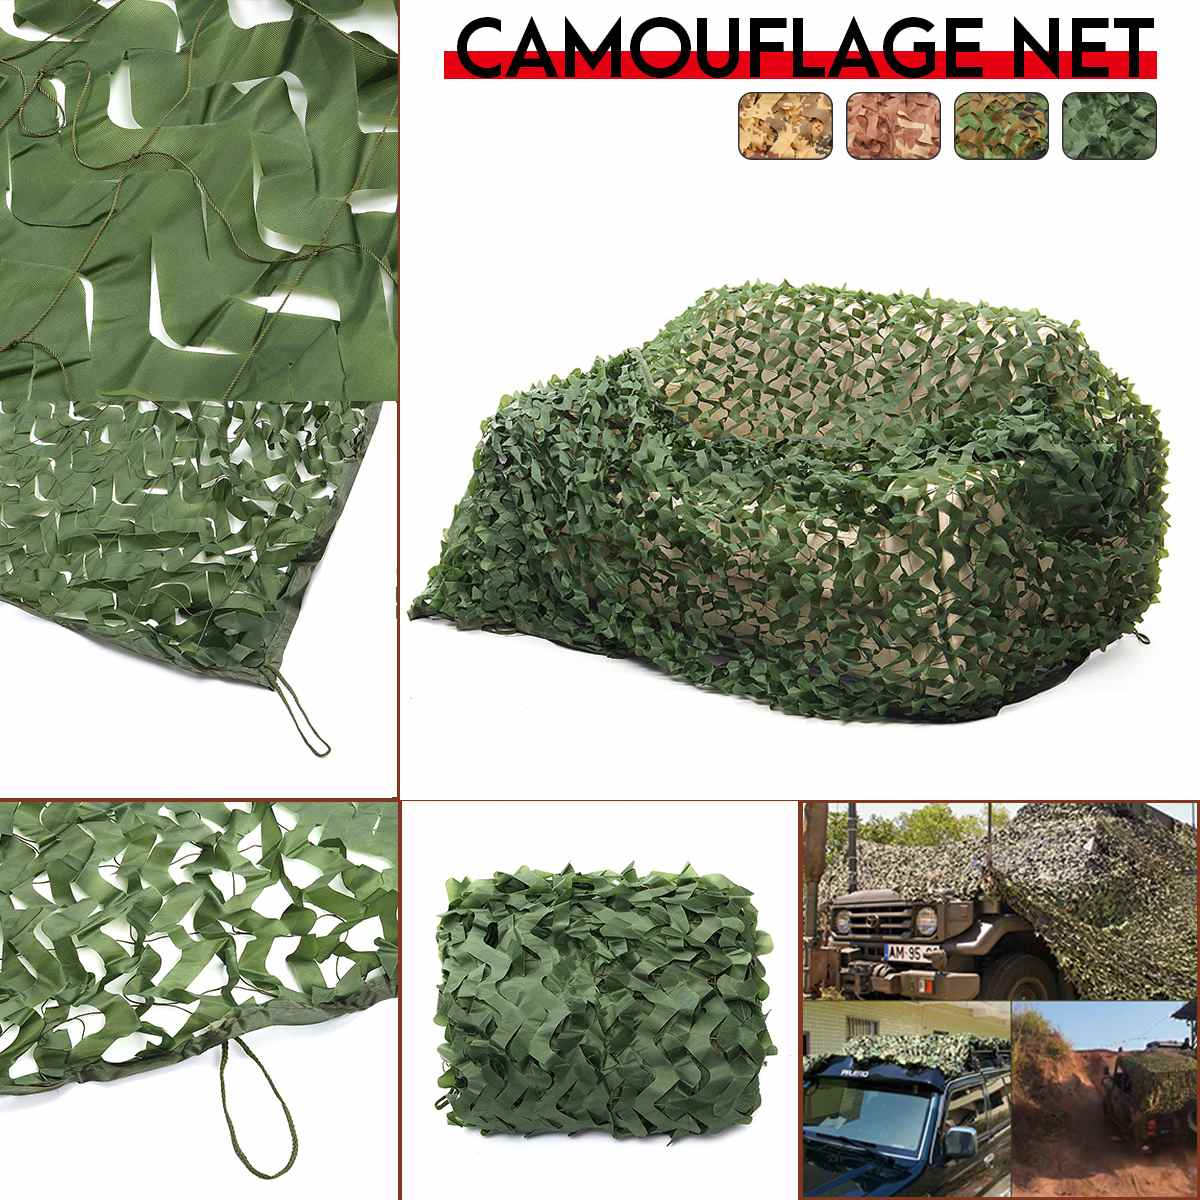 2X 8m/2x 5m/3x 4m/4x5m Doppel Schicht Military Camouflage net Sun Shelter Camo Netting für Jagd Camping Hause Dekoration